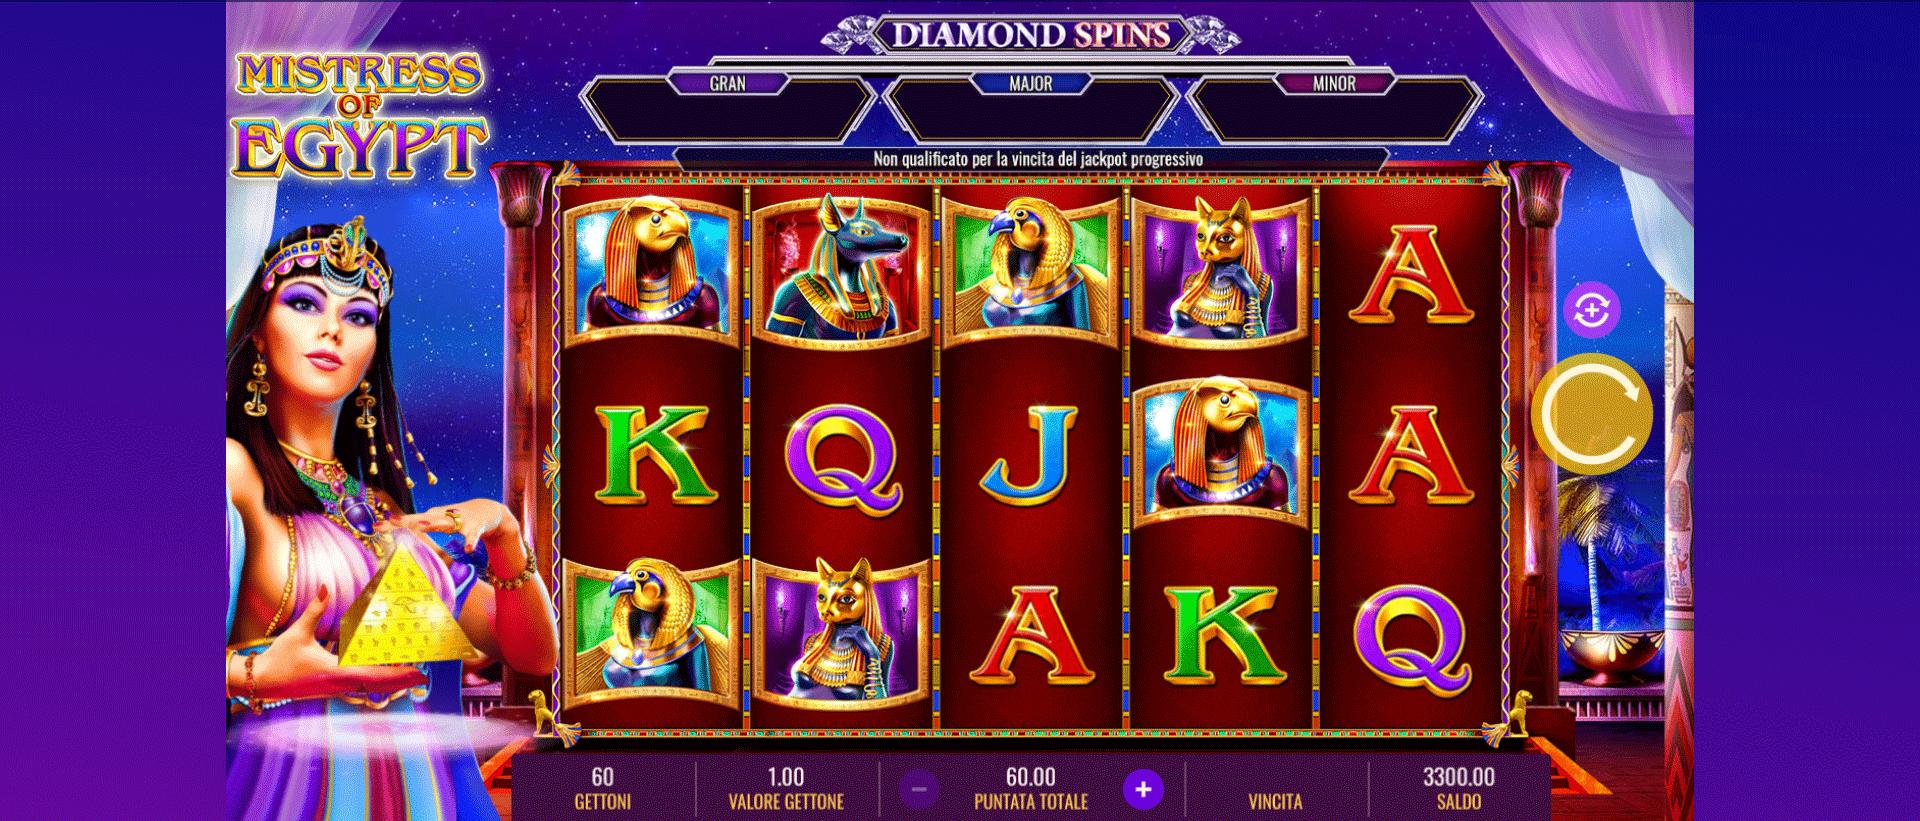 Slot Mistress of Egypt Diamond Spins